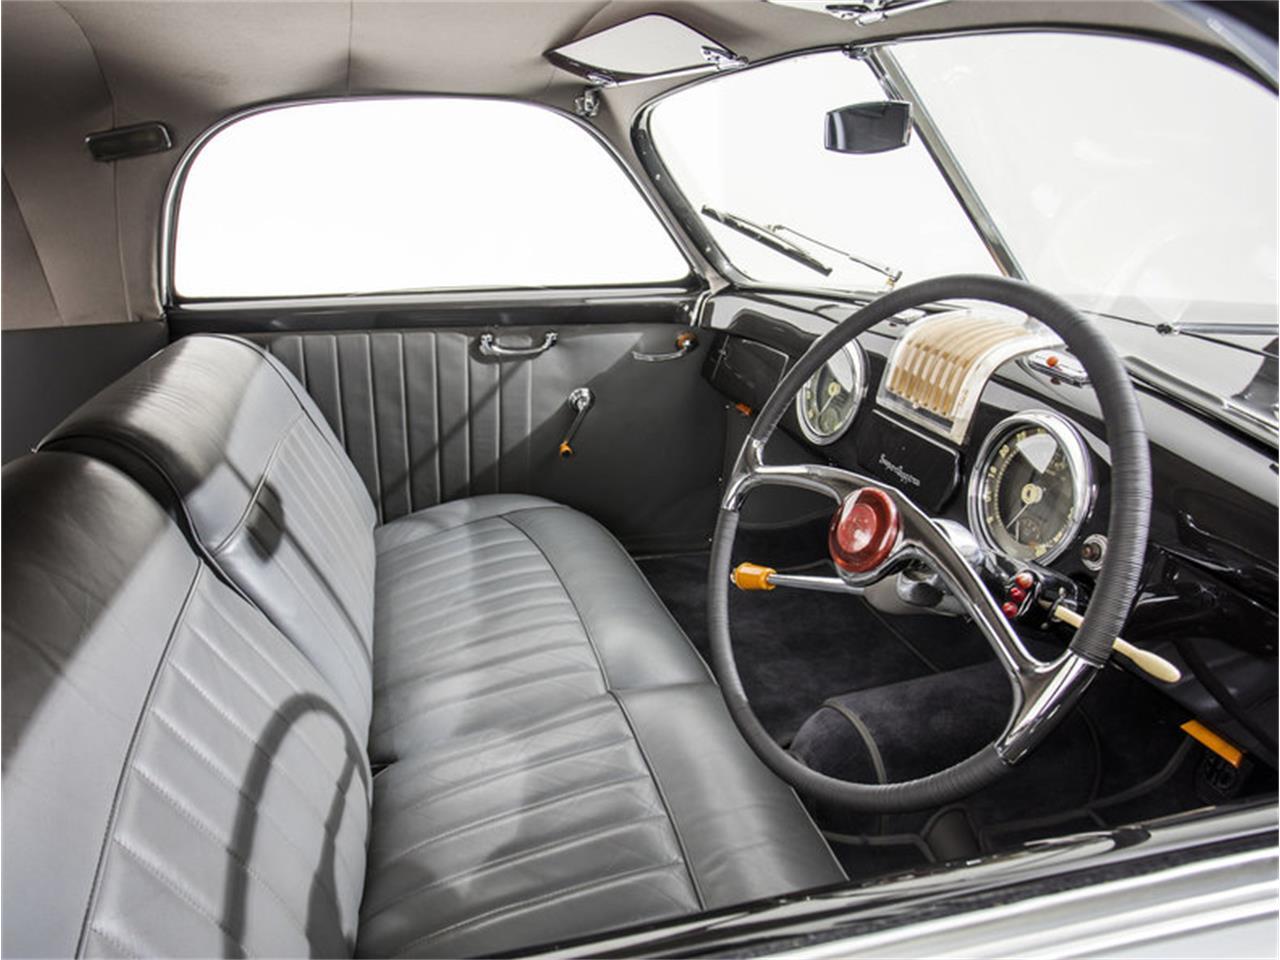 Large Picture of Classic '49 Alfa Romeo 6C 2500 SSC located in Newport Beach California Auction Vehicle - MZAQ